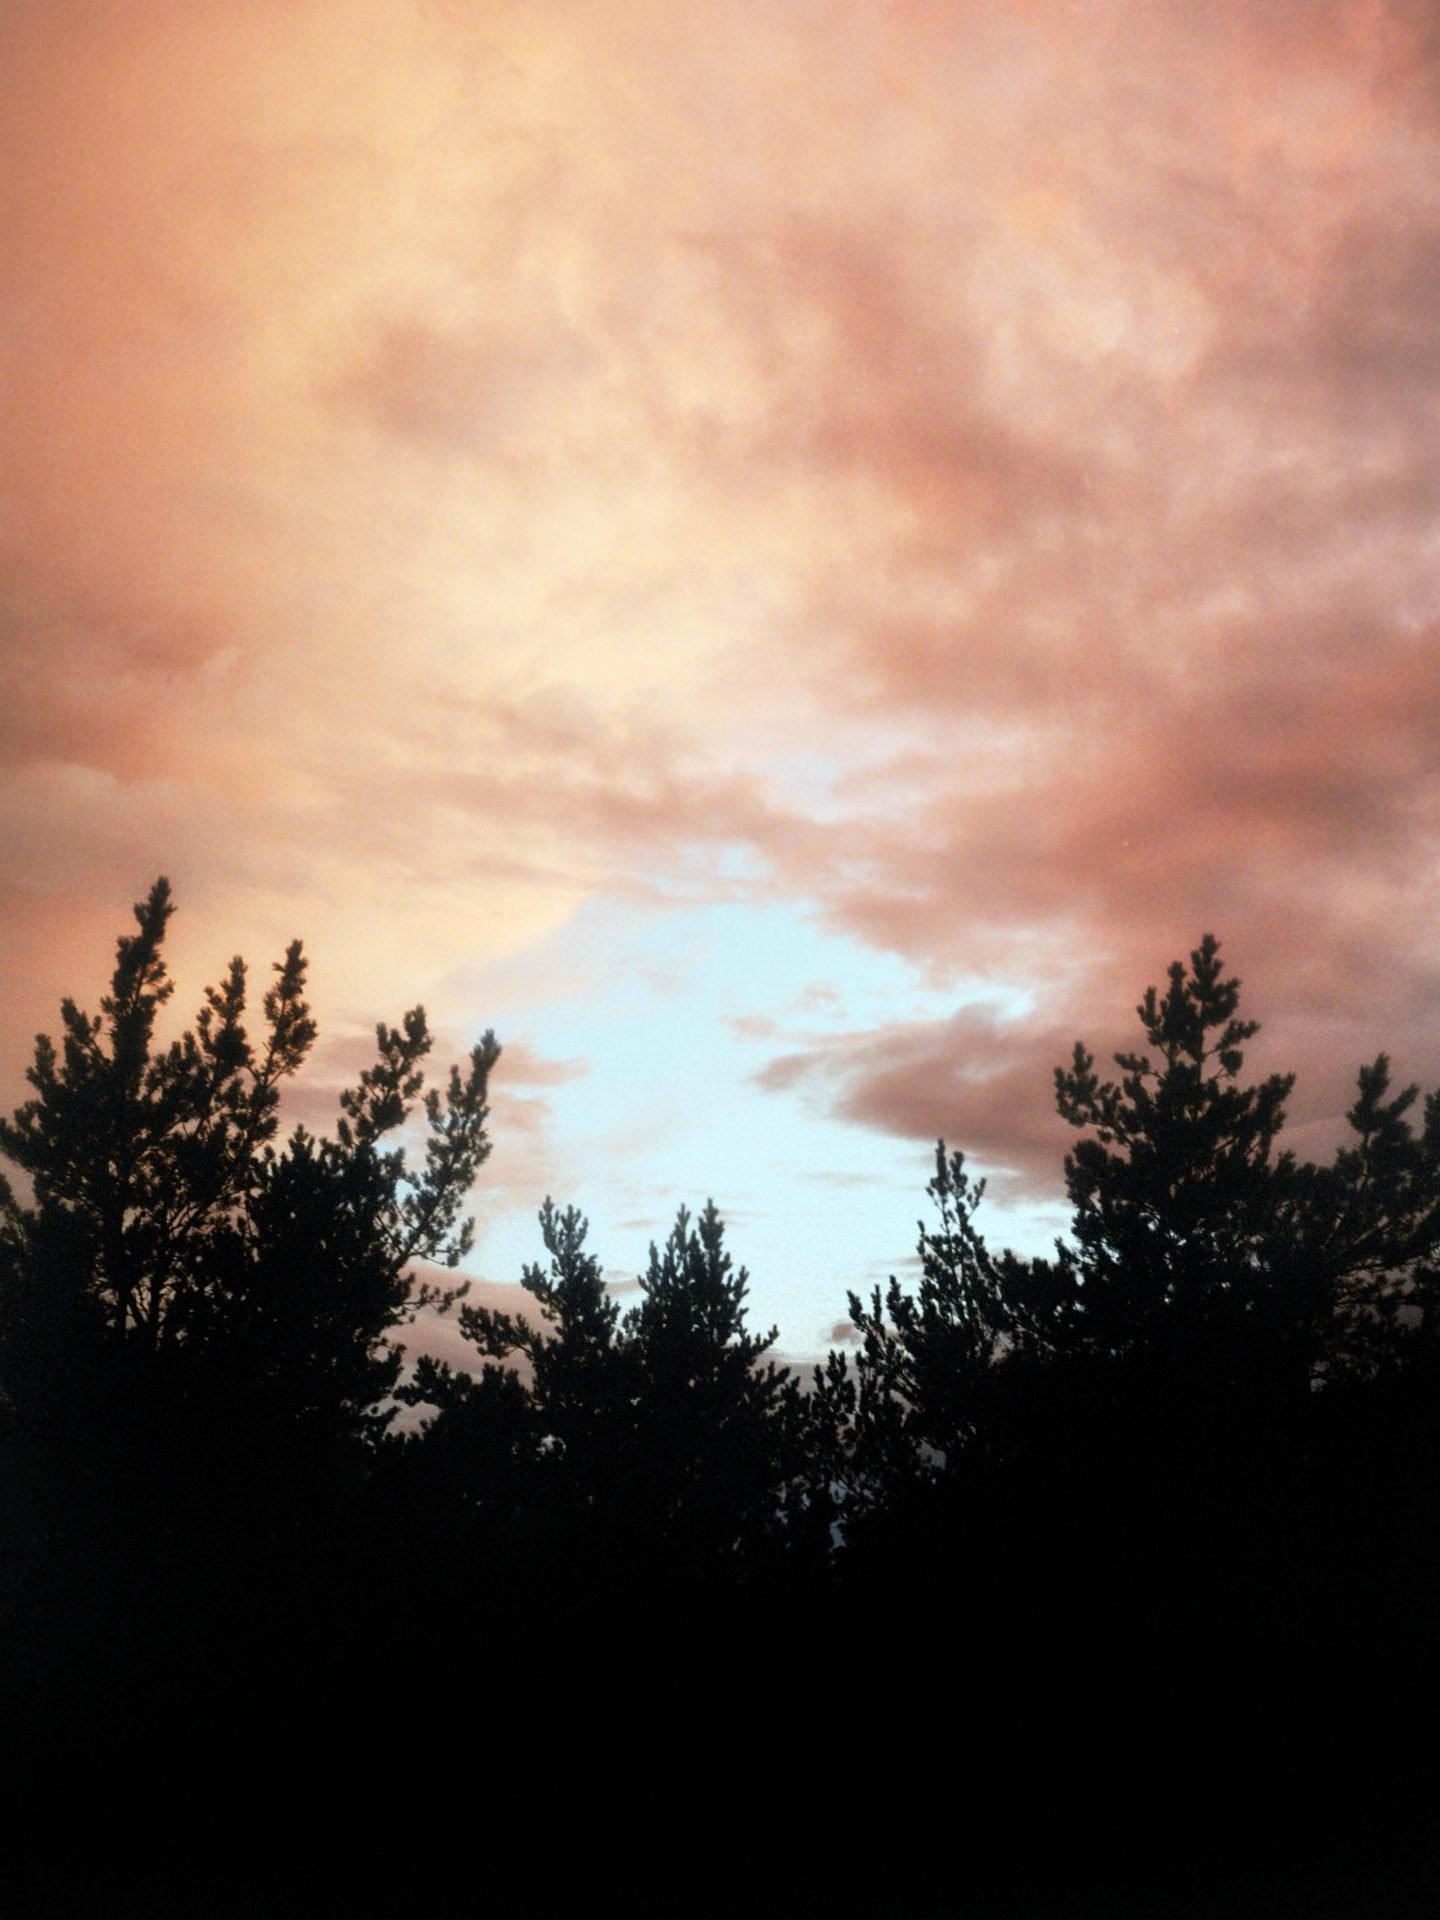 IGNANT-Photography-Jacques-Brun-Sunset-Garden-03